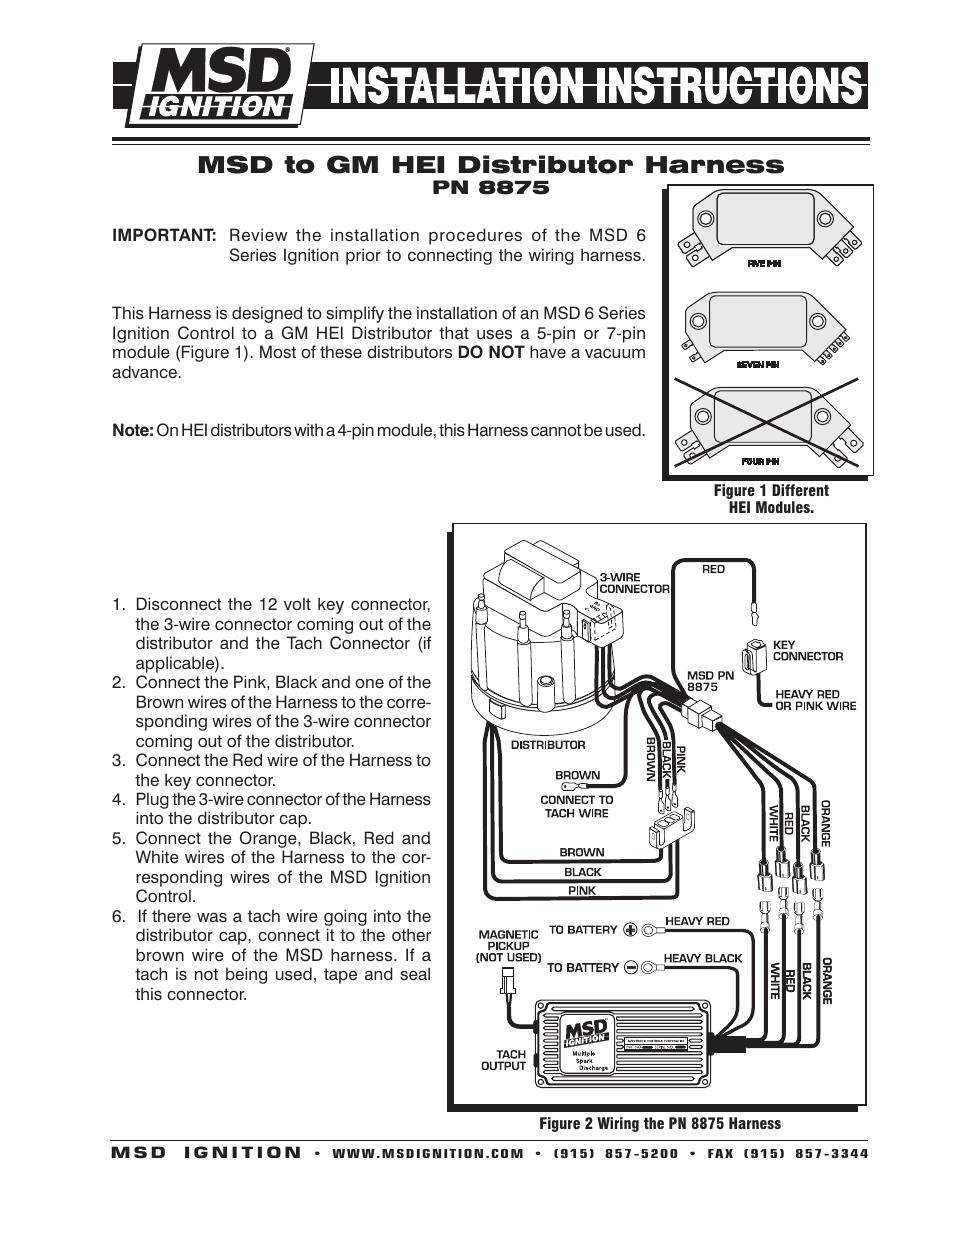 3 Wire Delco Alternator Wiring Diagram Tach Wire